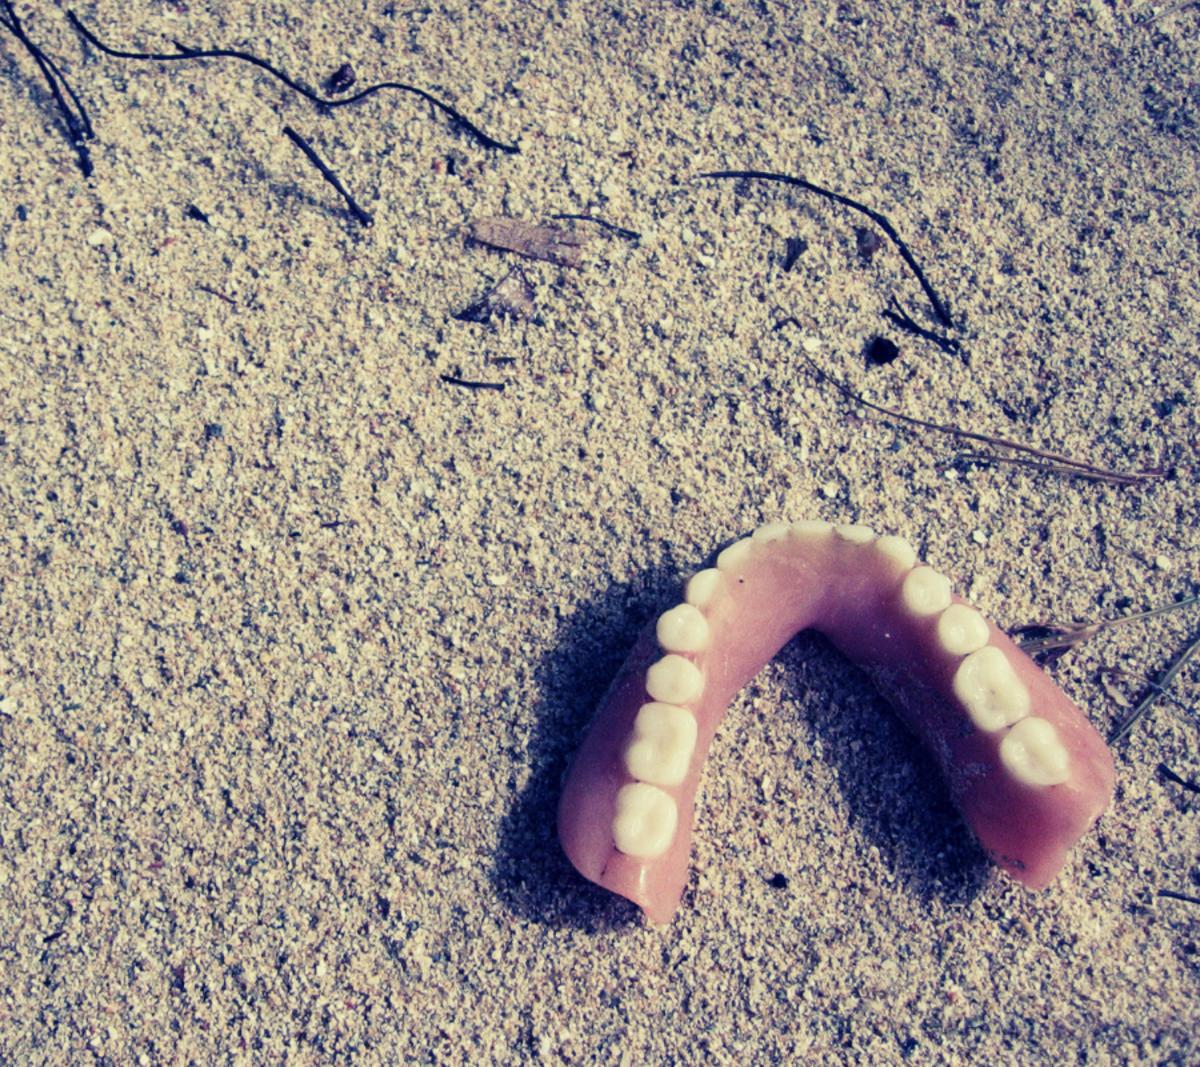 teeth-falling-out-dream